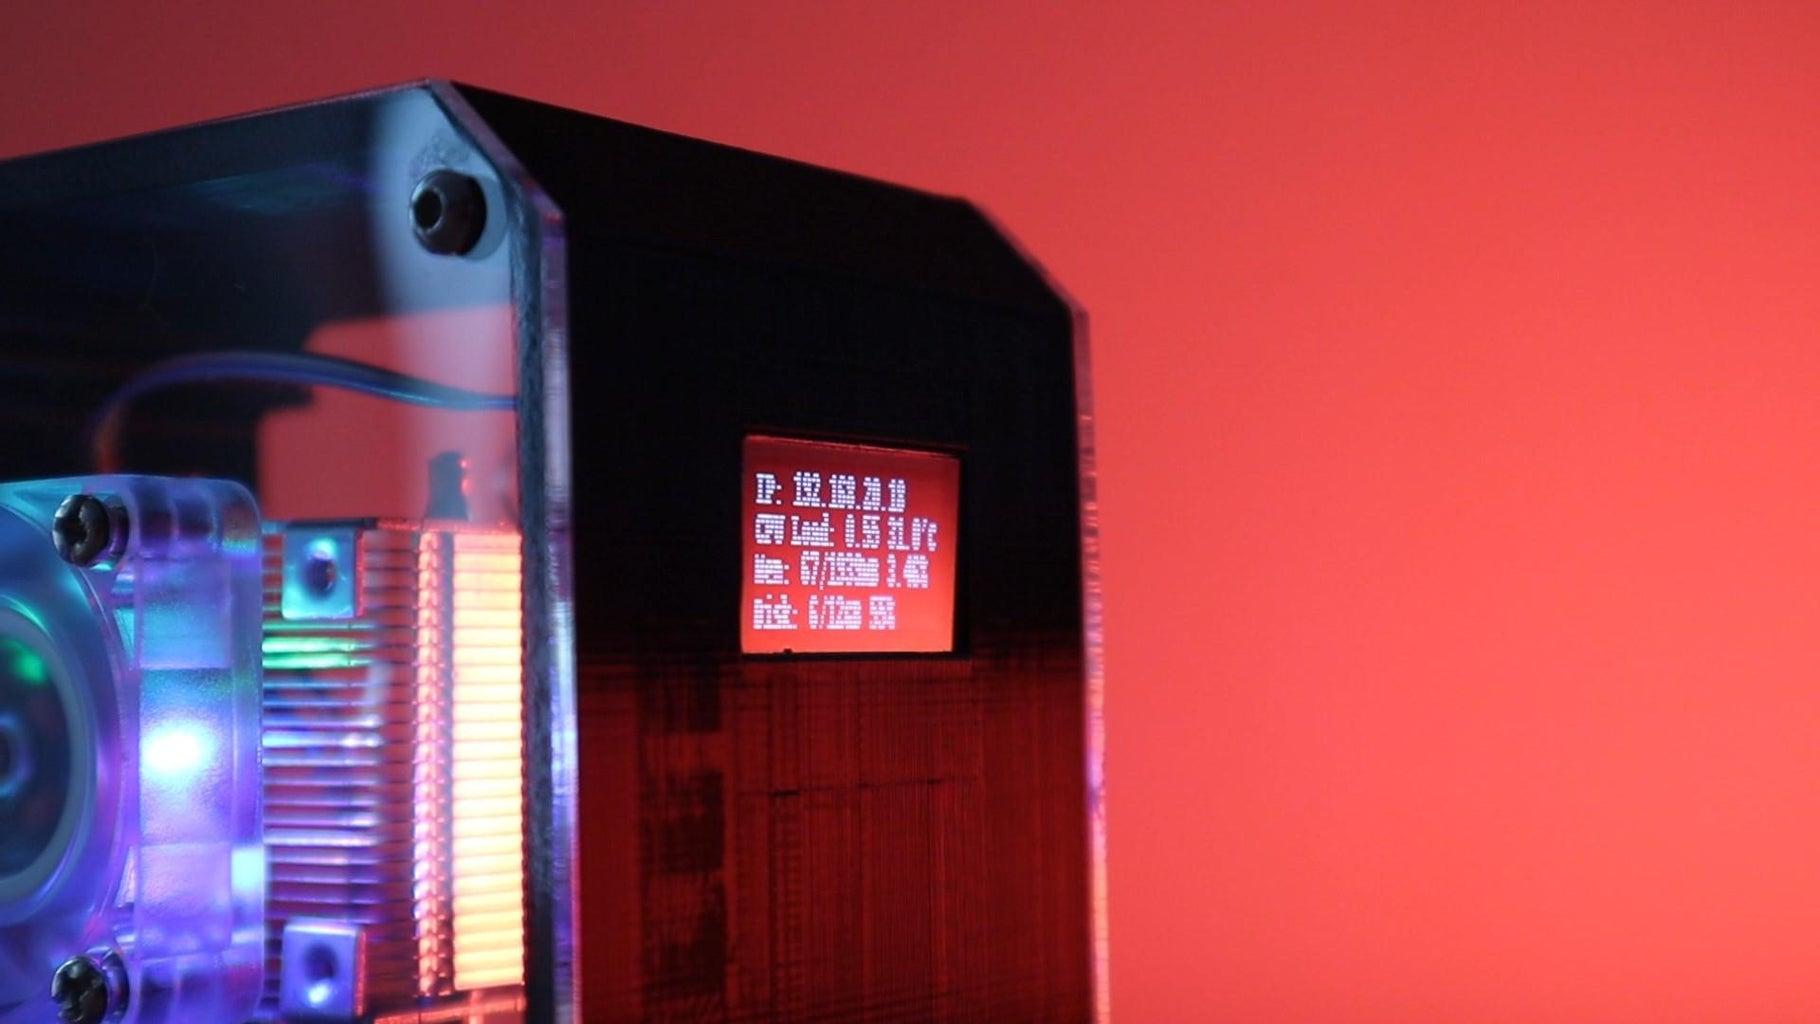 Program the OLED Display